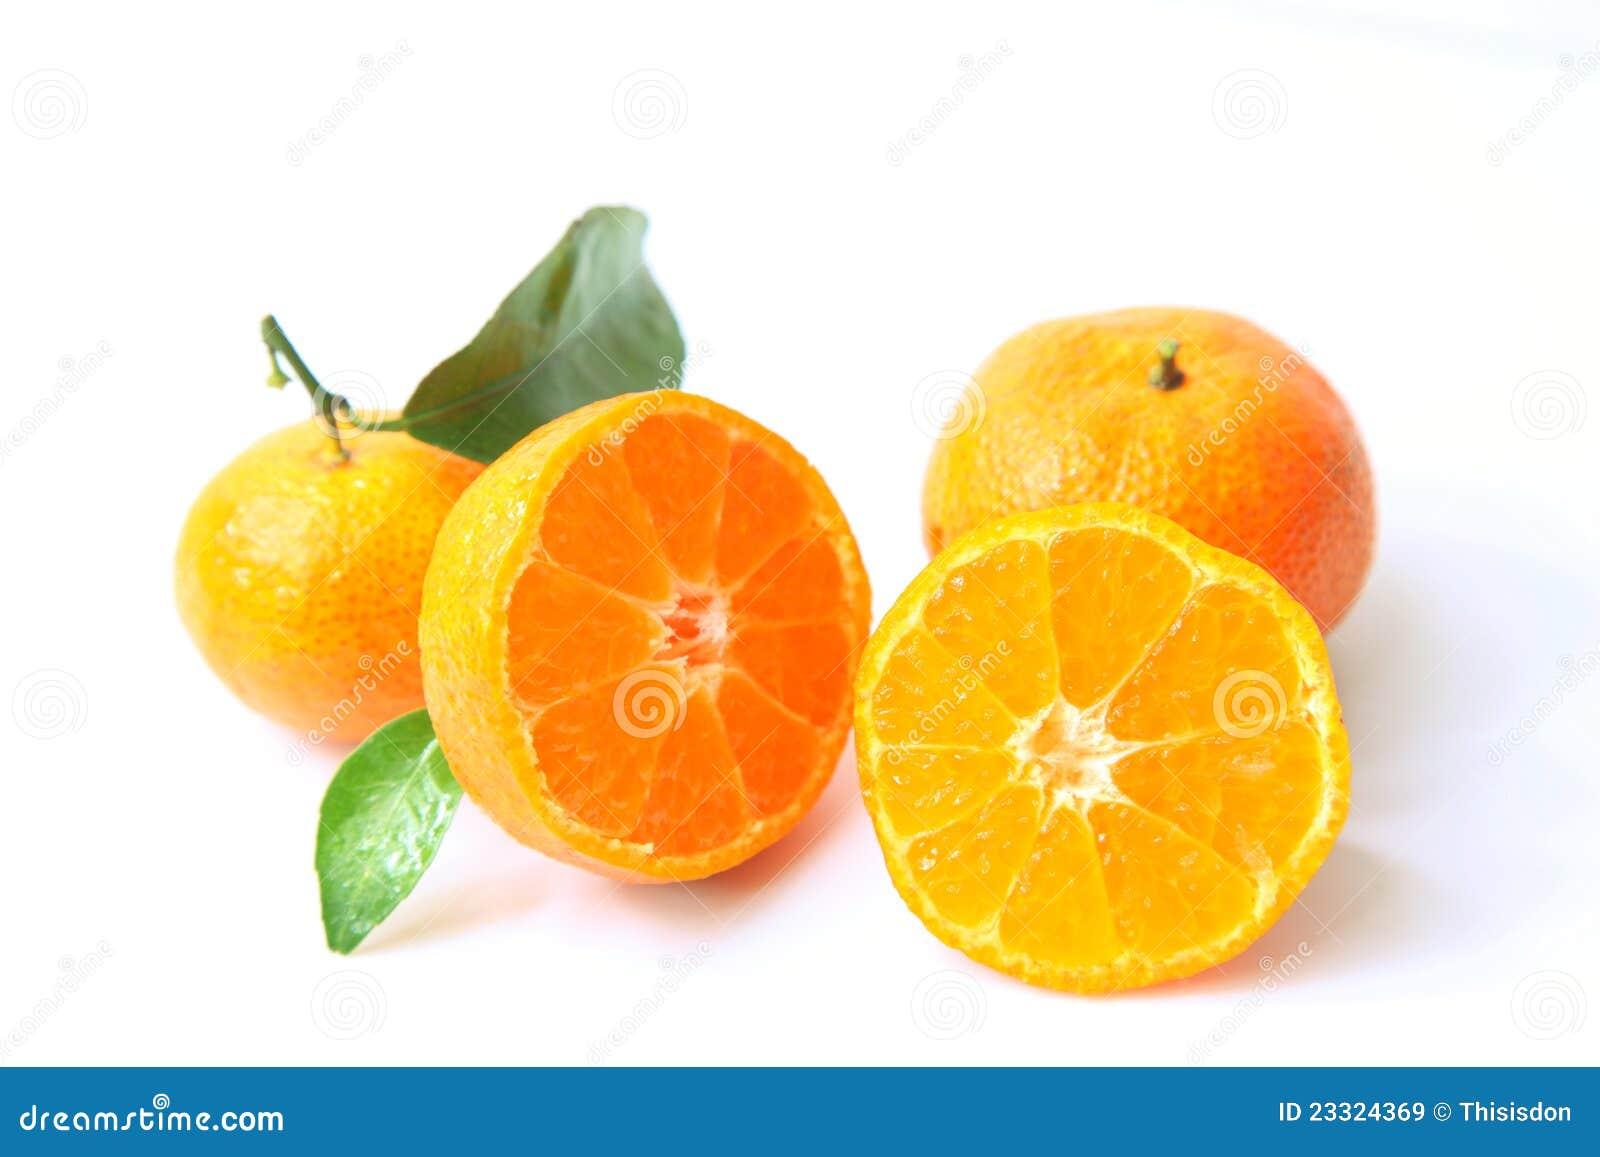 Cut Open Orange Royalty Free Stock Images - Image: 23324369